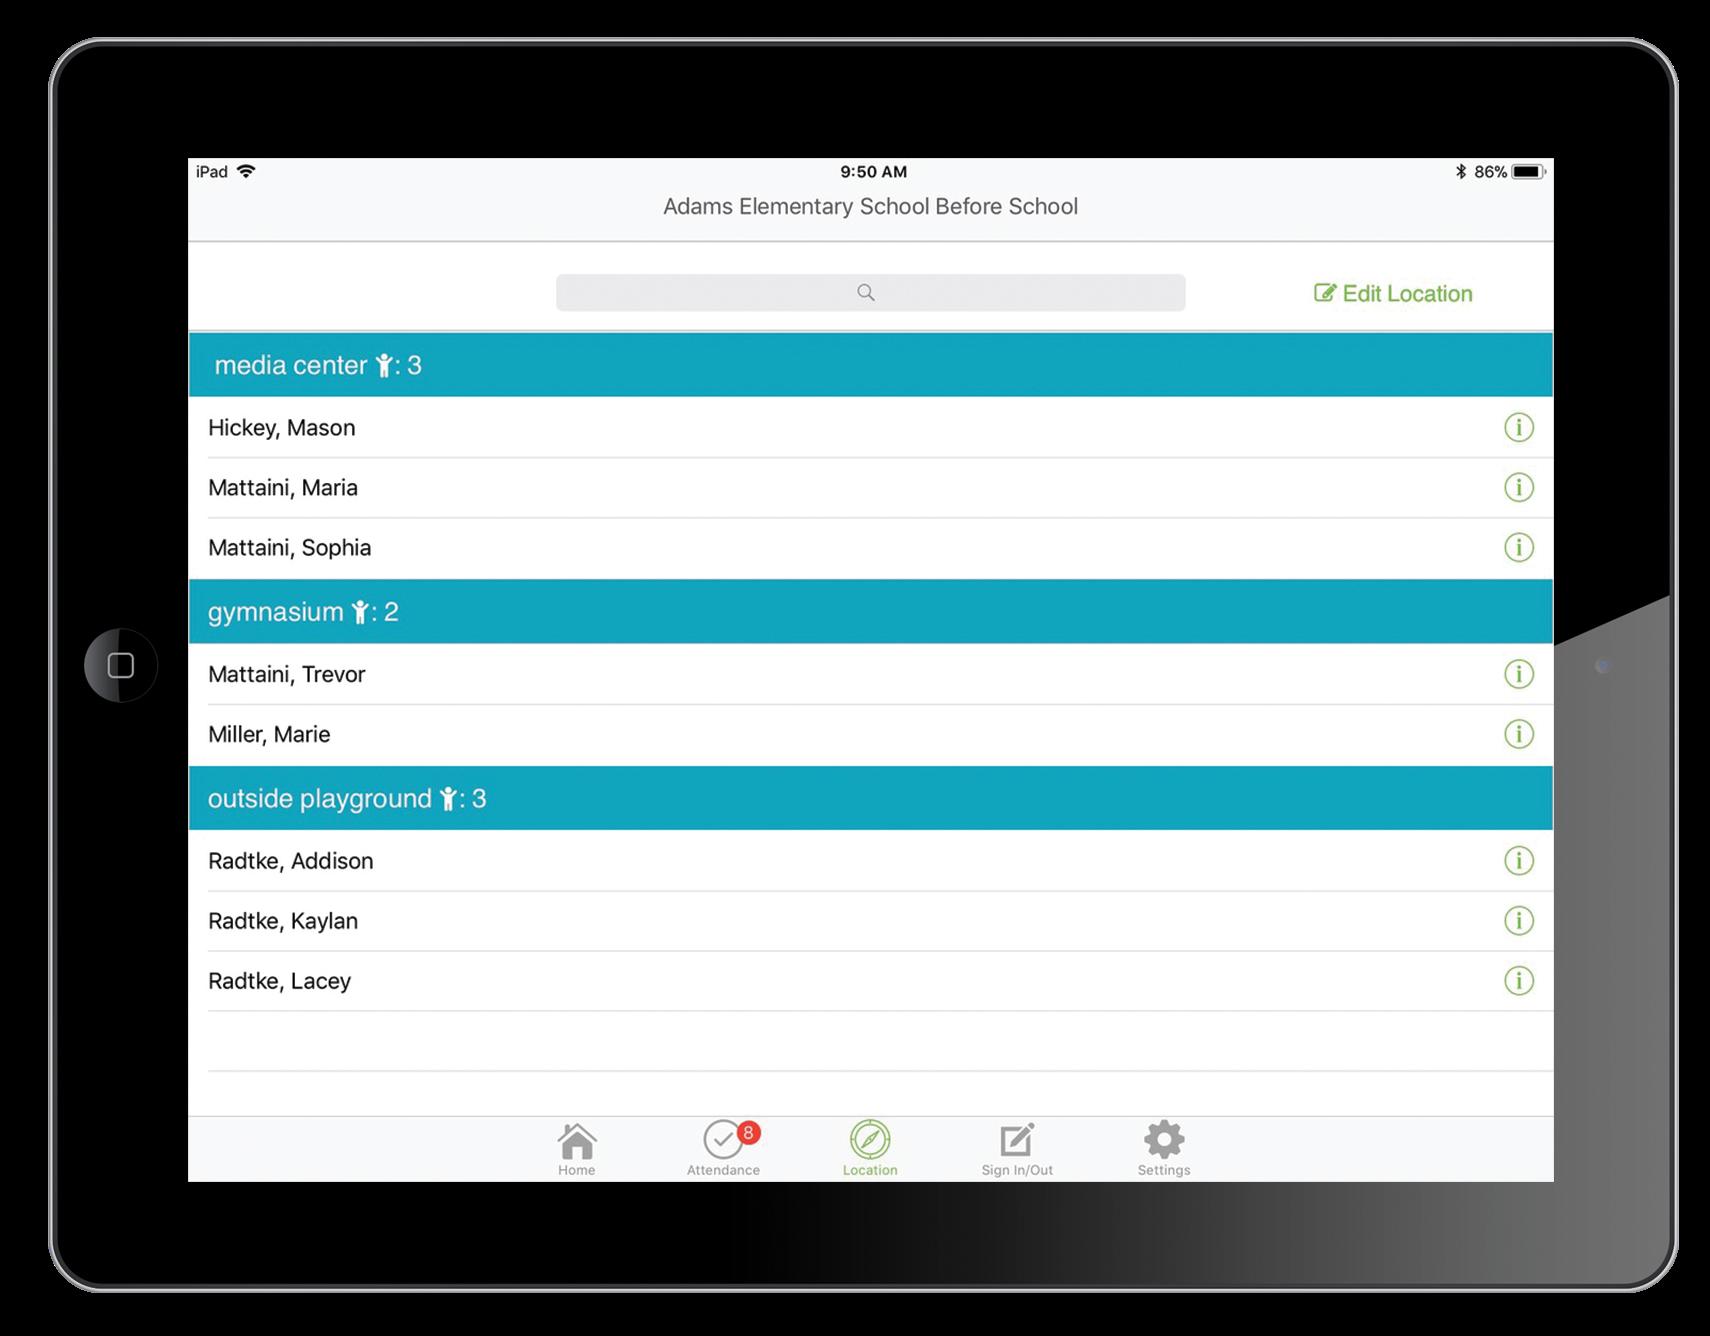 iPad Attendance App Child Location Screen